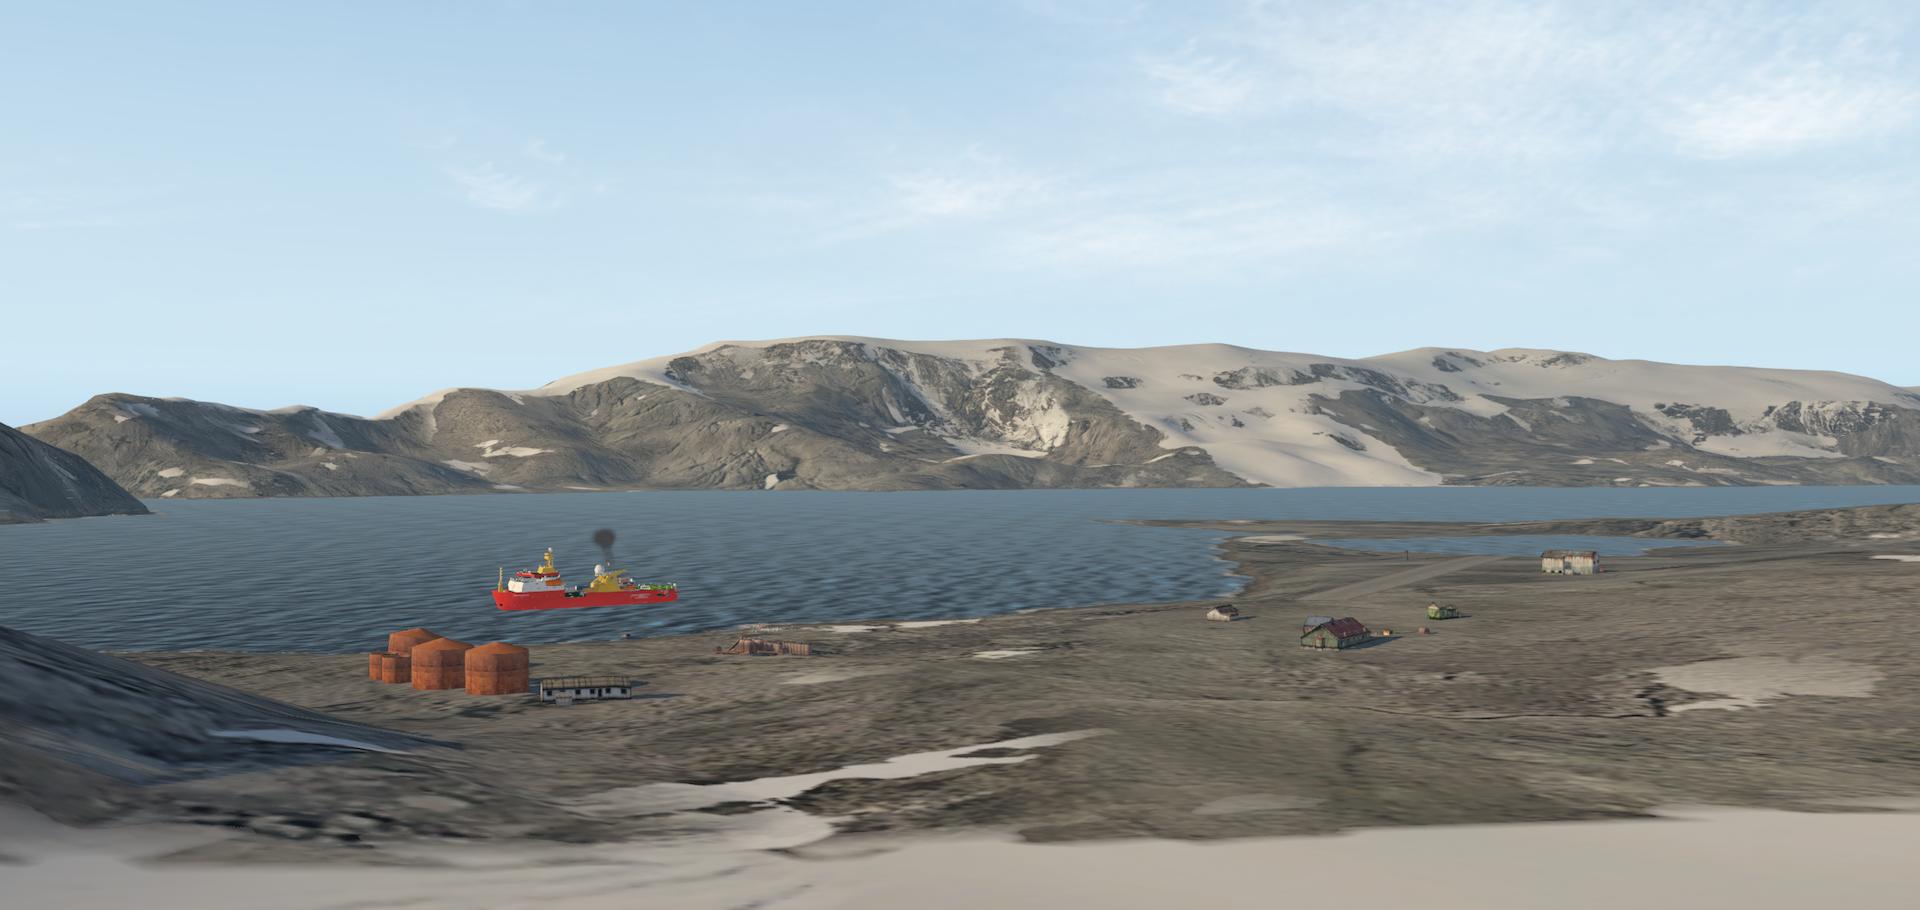 maps2xplane_feature_antarctica_wilkins.p